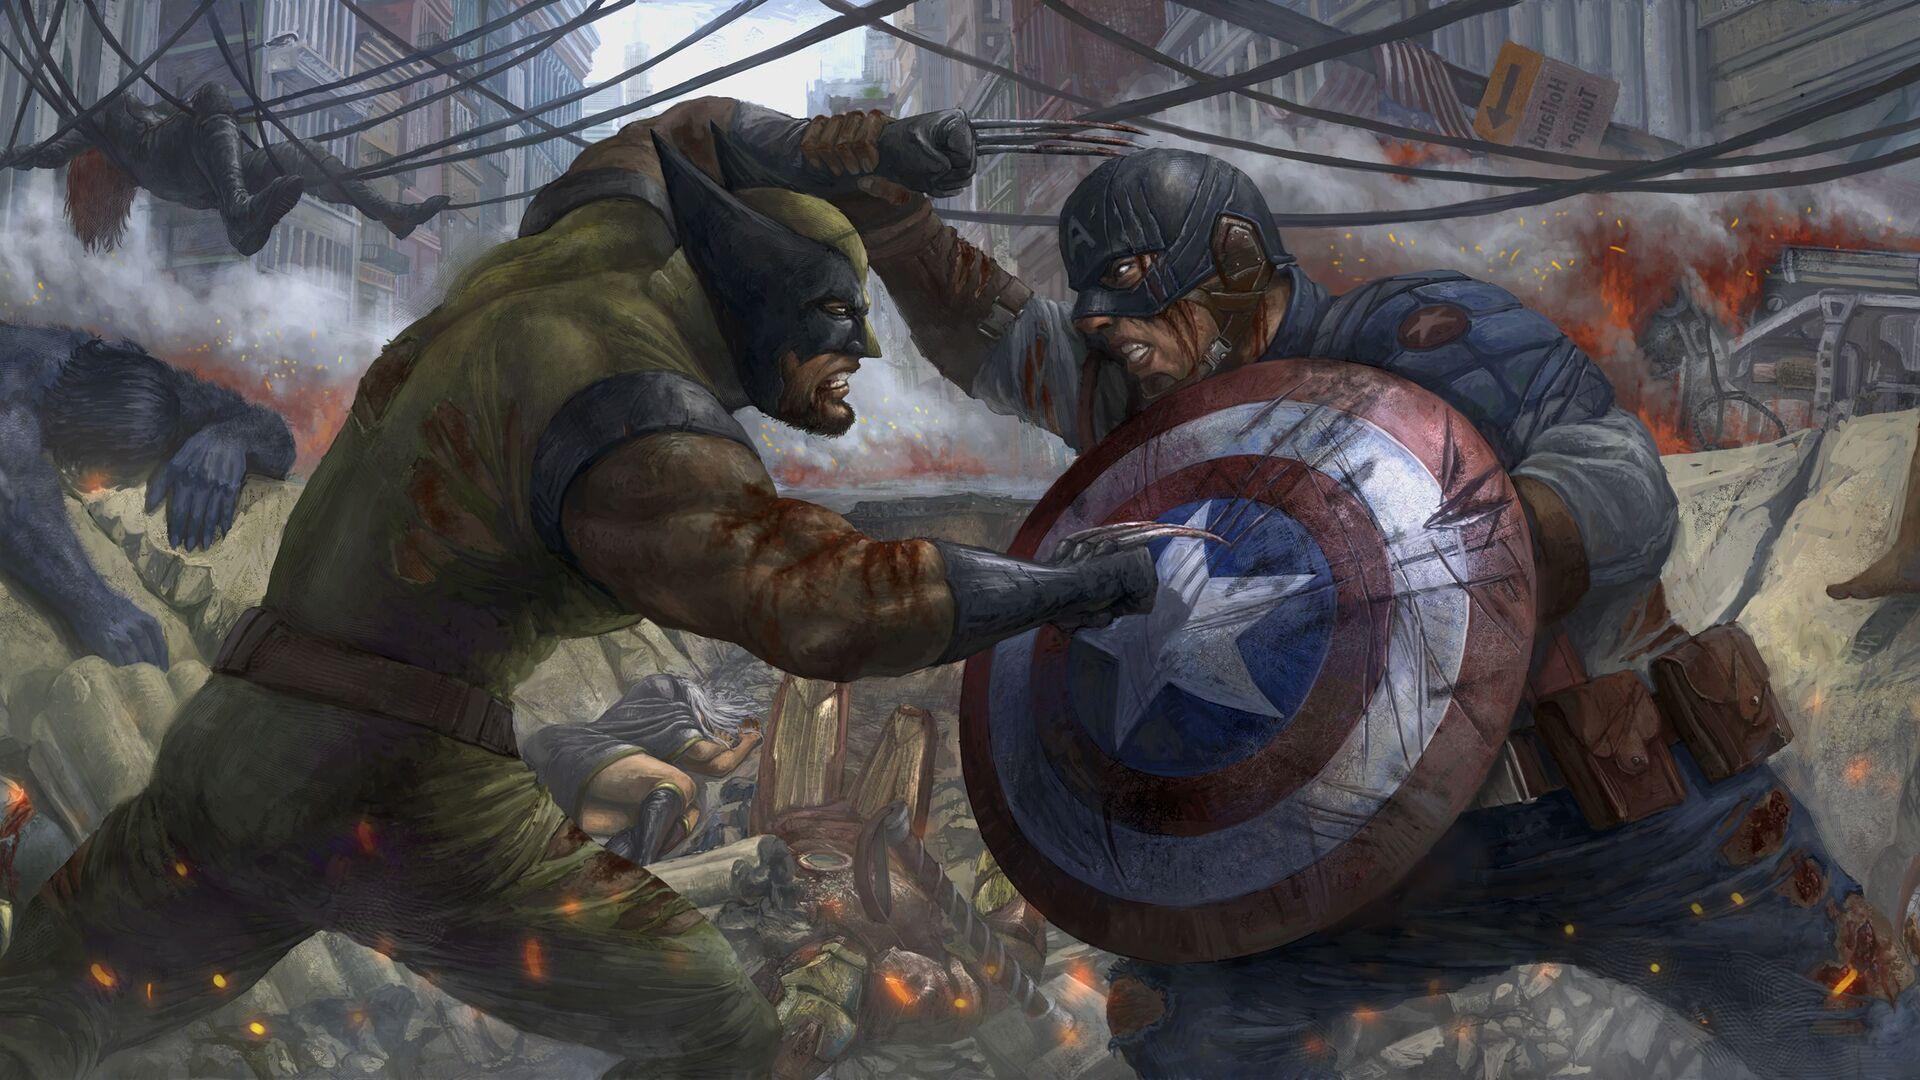 1920x1080 Captain America Vs Wolverine Laptop Full HD ...